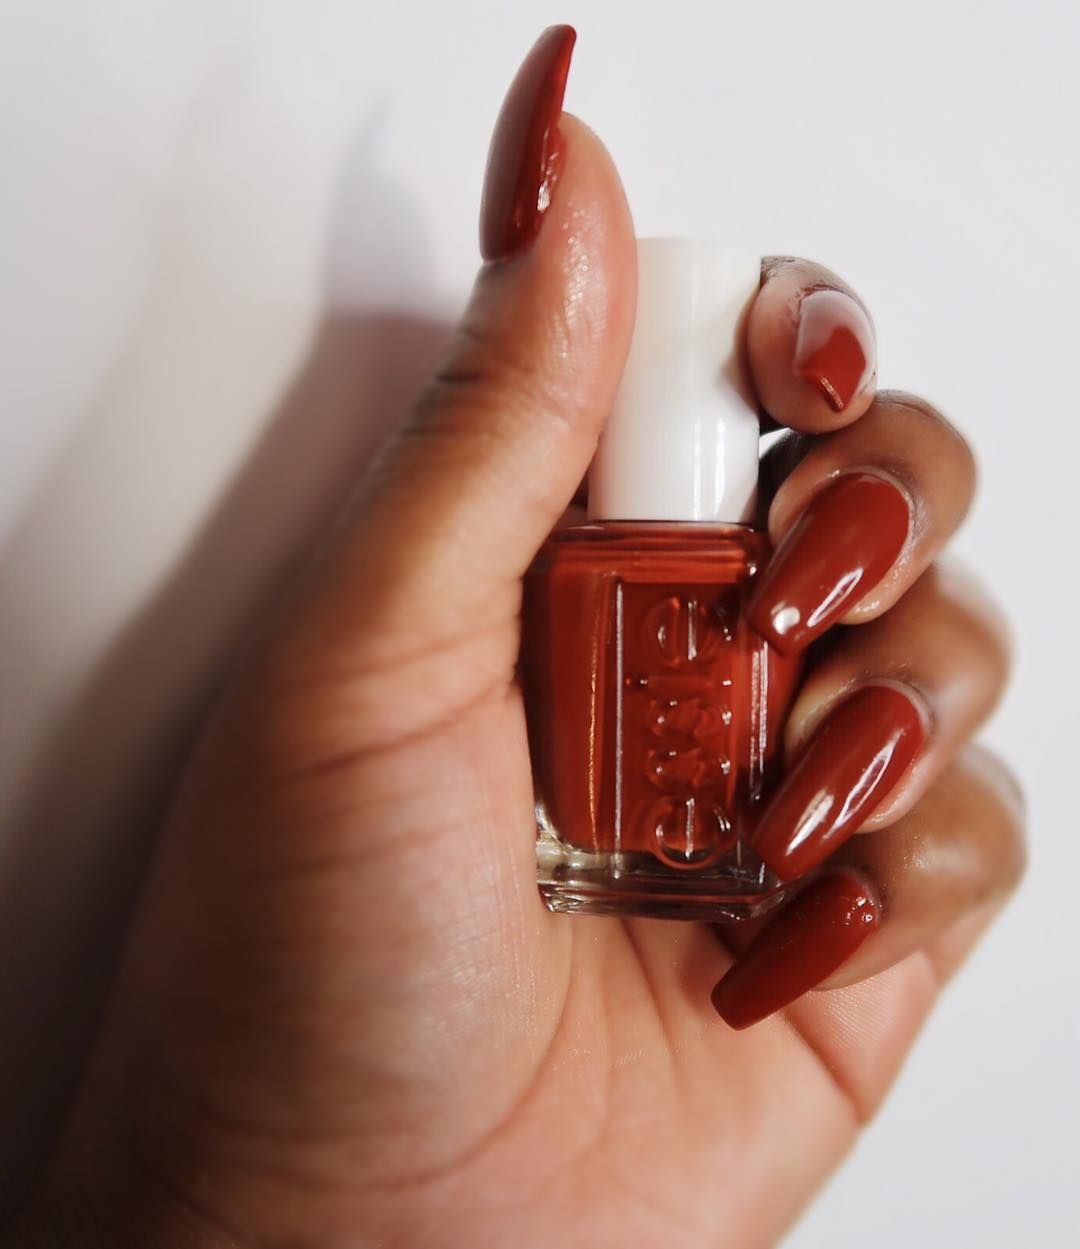 Maroon Nail Polish On Dark Skin - Creative Touch